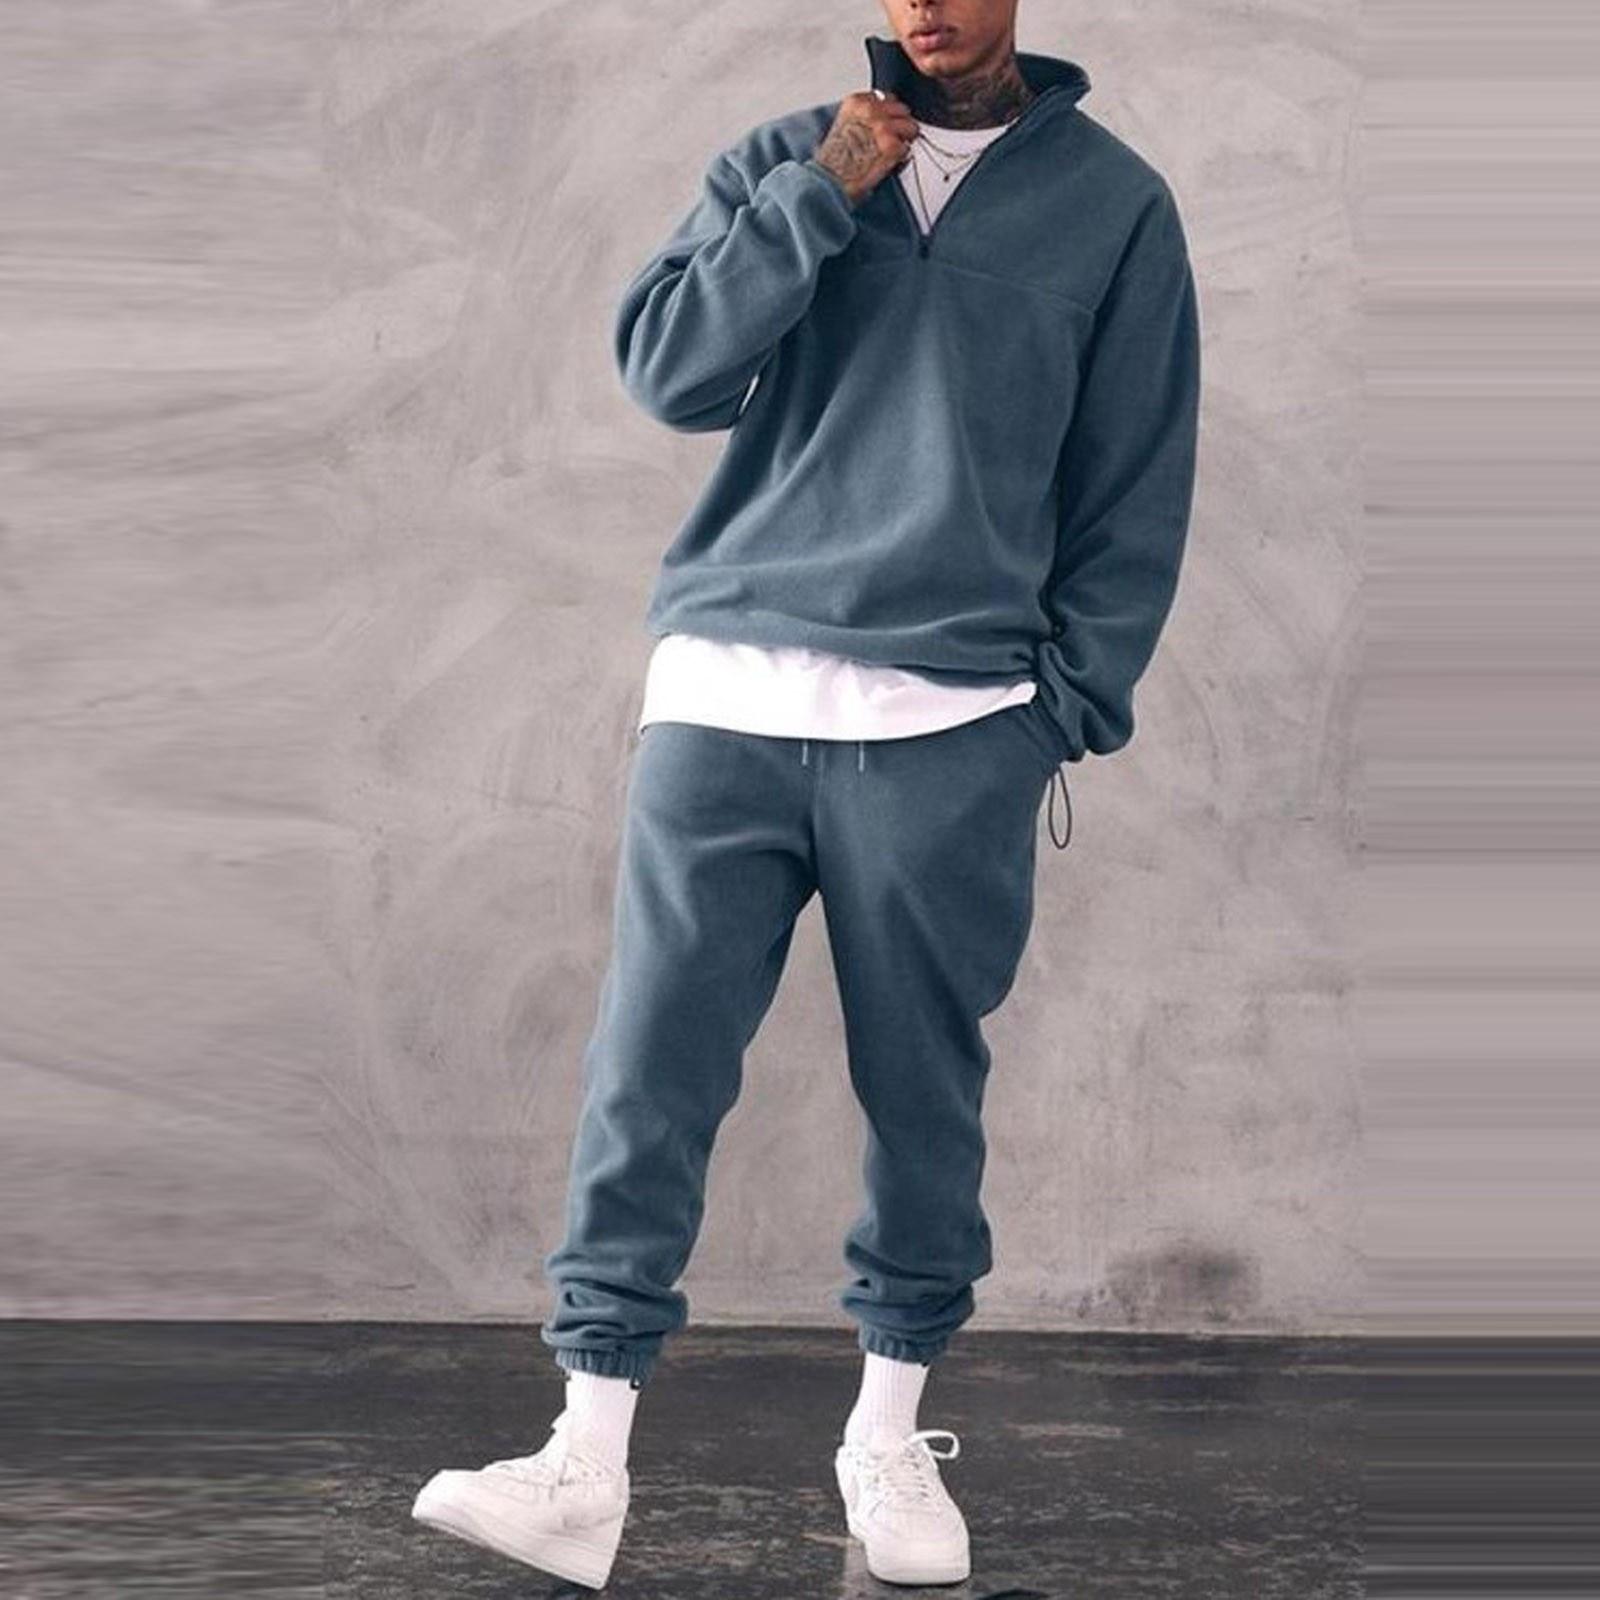 Sweatshirts Set Men Winter Warm Fashion 2021 Men's Jogger Tracksuit Solid Stand Collar Sweatshirt Casual 2 Pieces Sports Suits